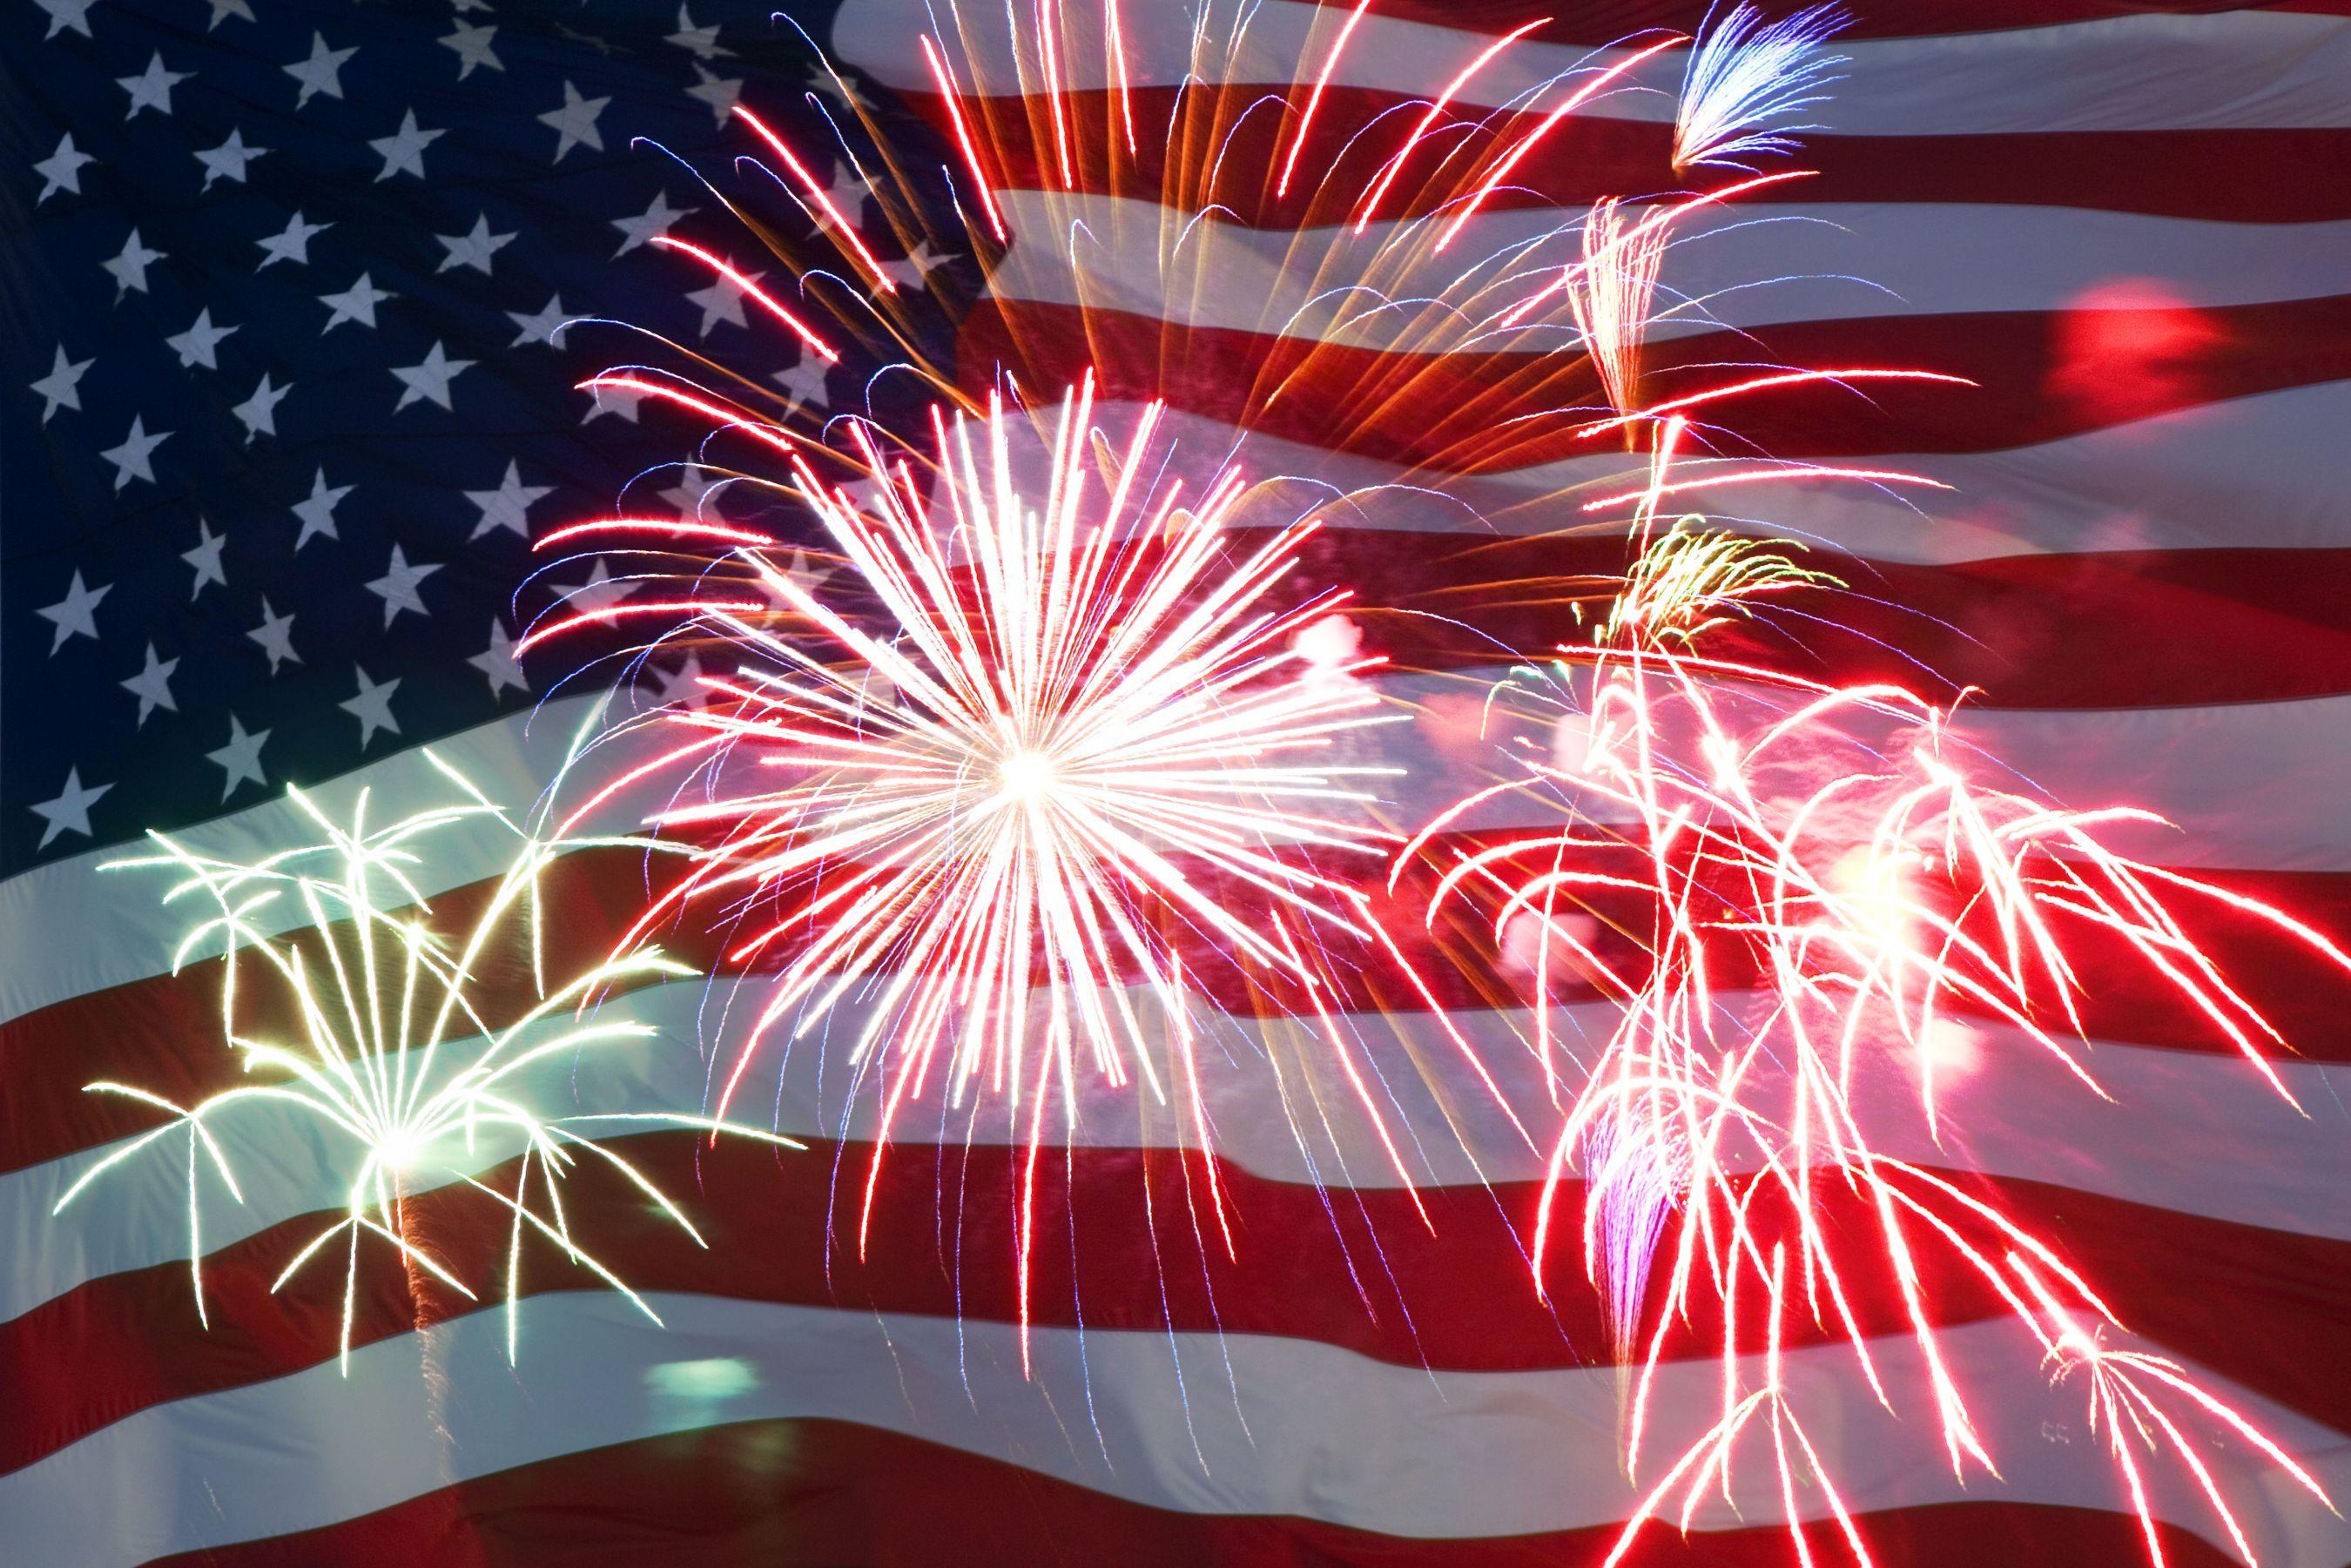 28daf0bad1bd63cee86e_flag-fireworks.jpg